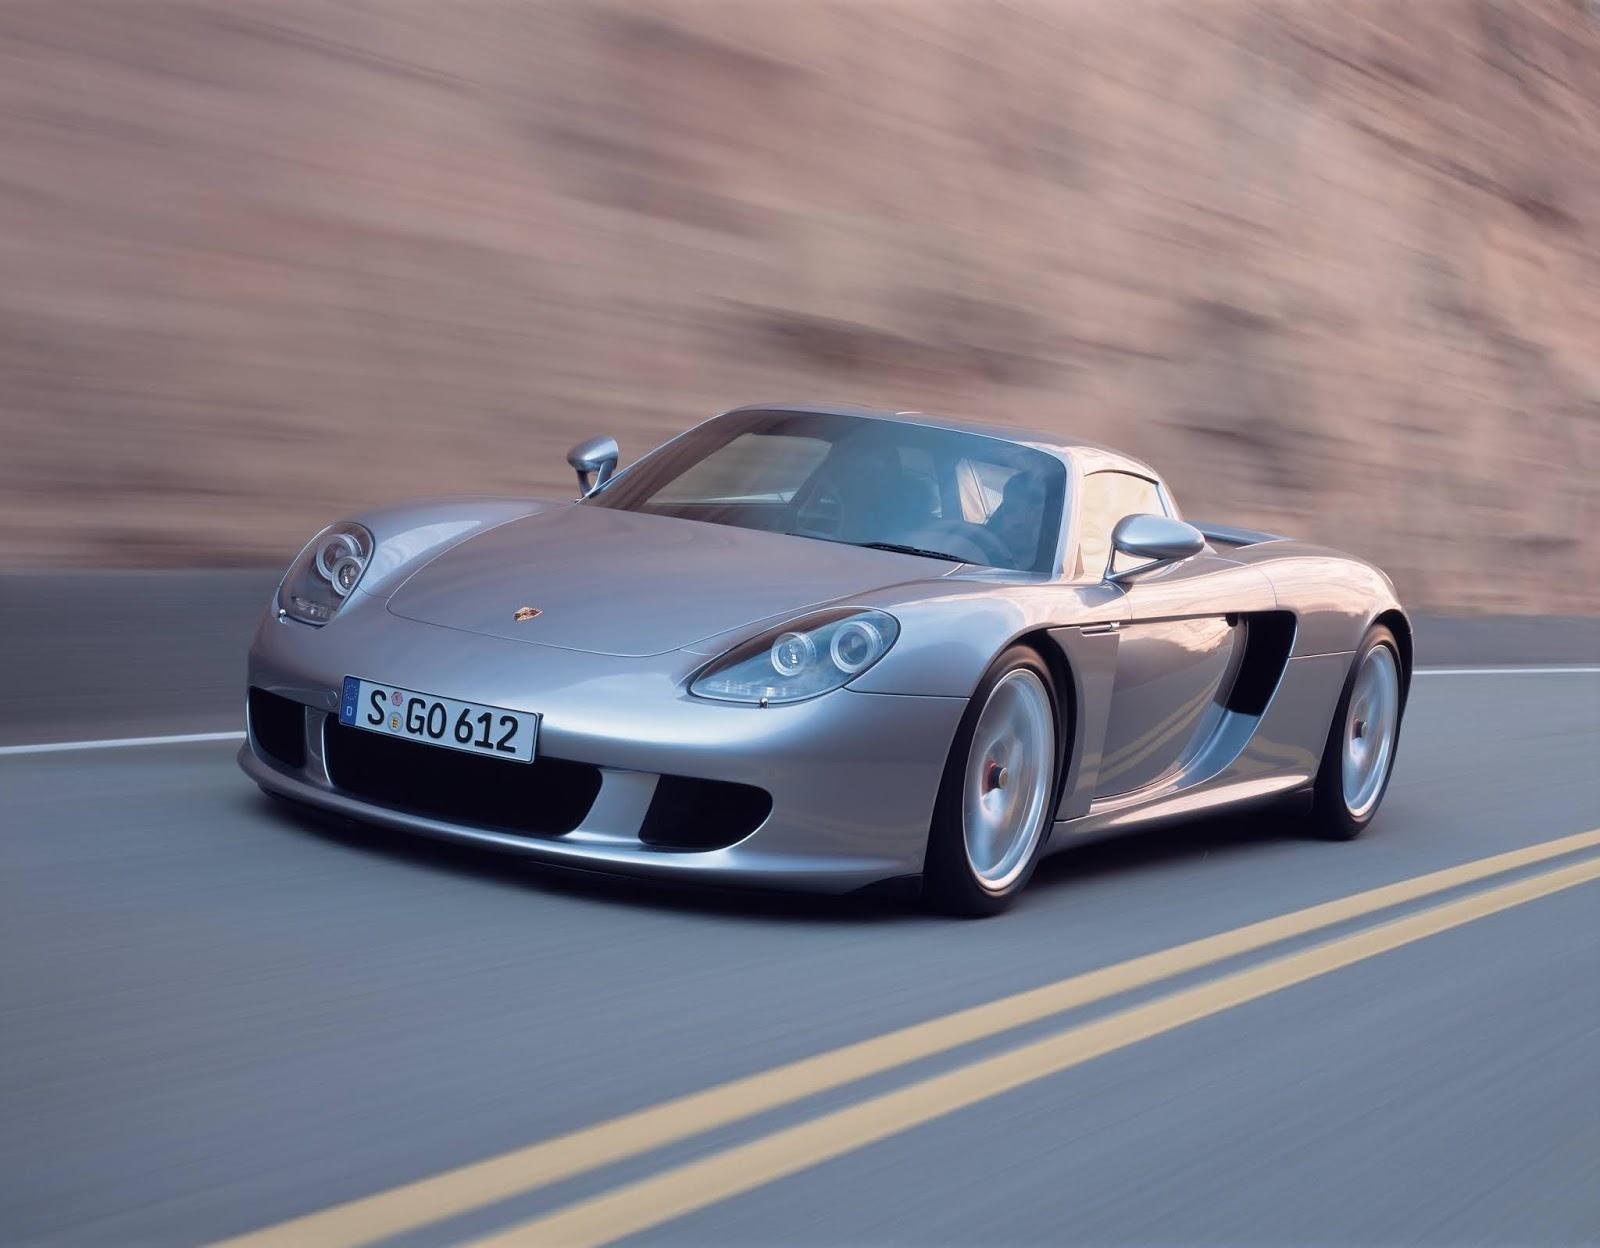 P03 0559 a4 Porsche Carrera GT : Ένα αγωνιστικό LeMans, για το δρόμο Carrera GT, Porsche, Porsche Carrera GT, retrocar, retrocar sunday, supercar, zblog